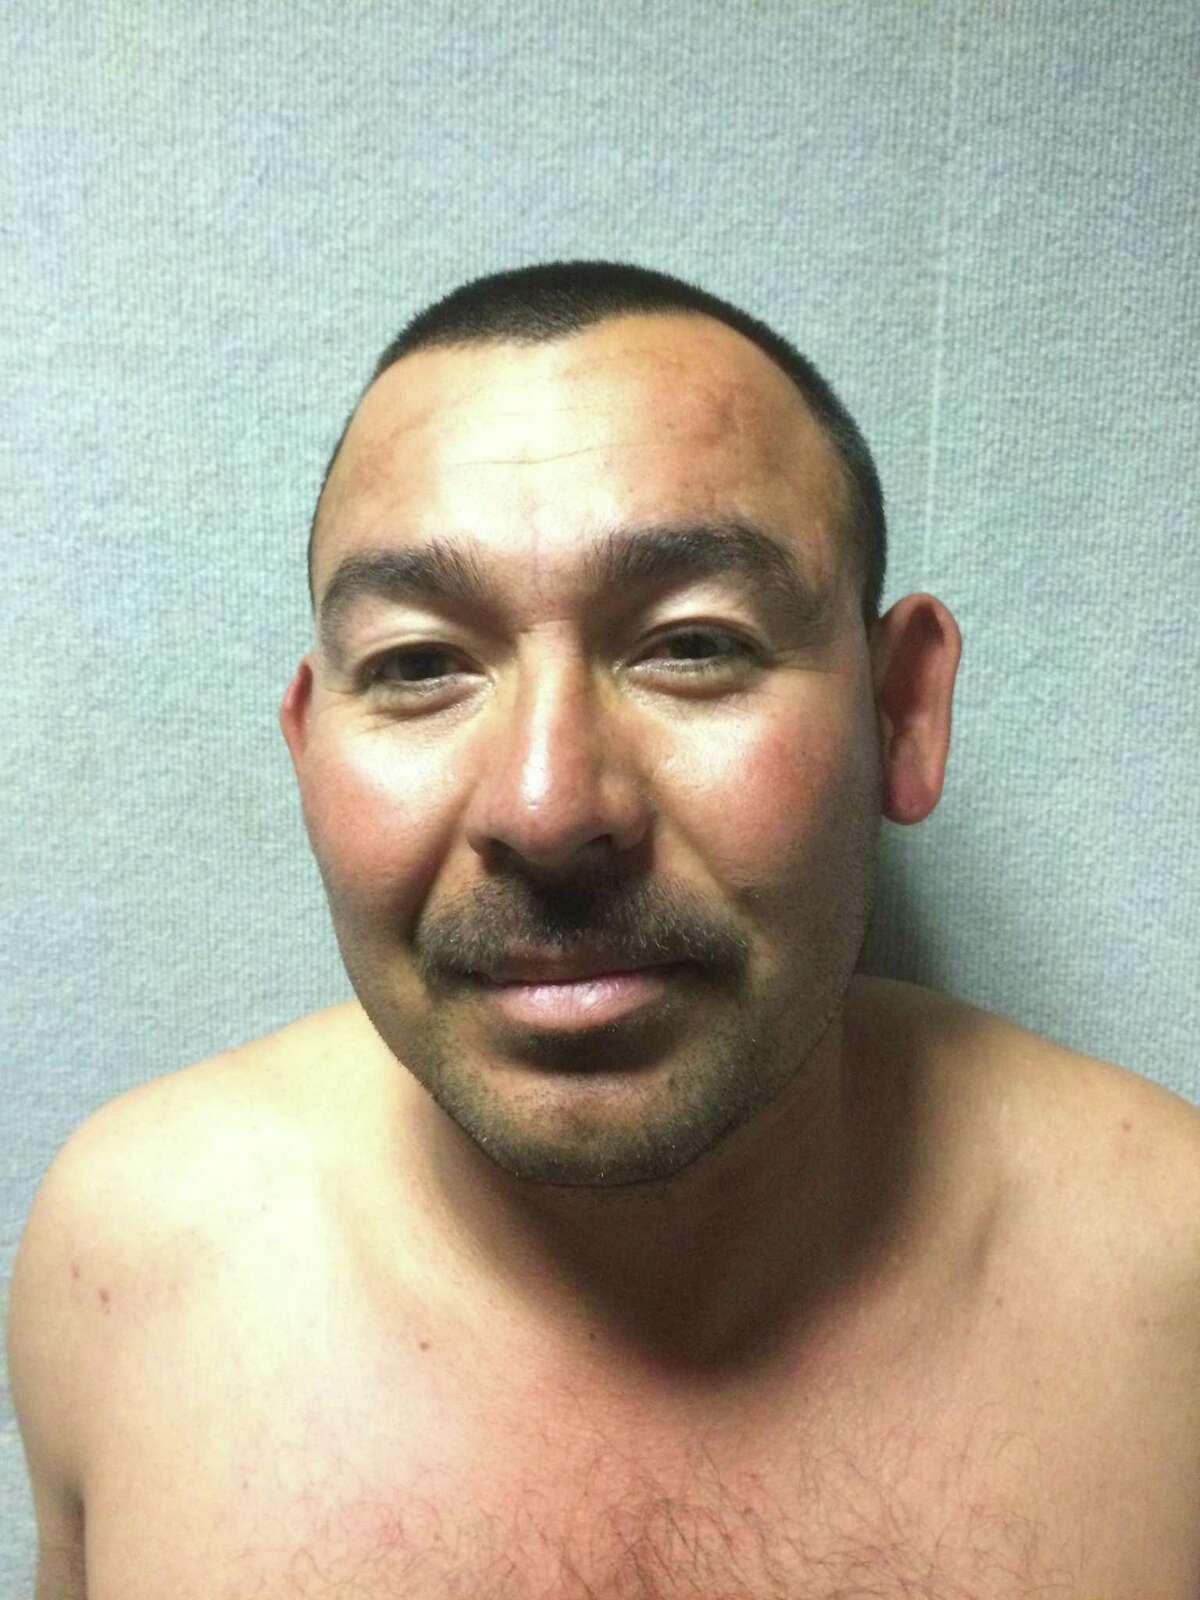 Eulalio Miniz Orozco, 39, was arrested on suspicion of attempted murder.